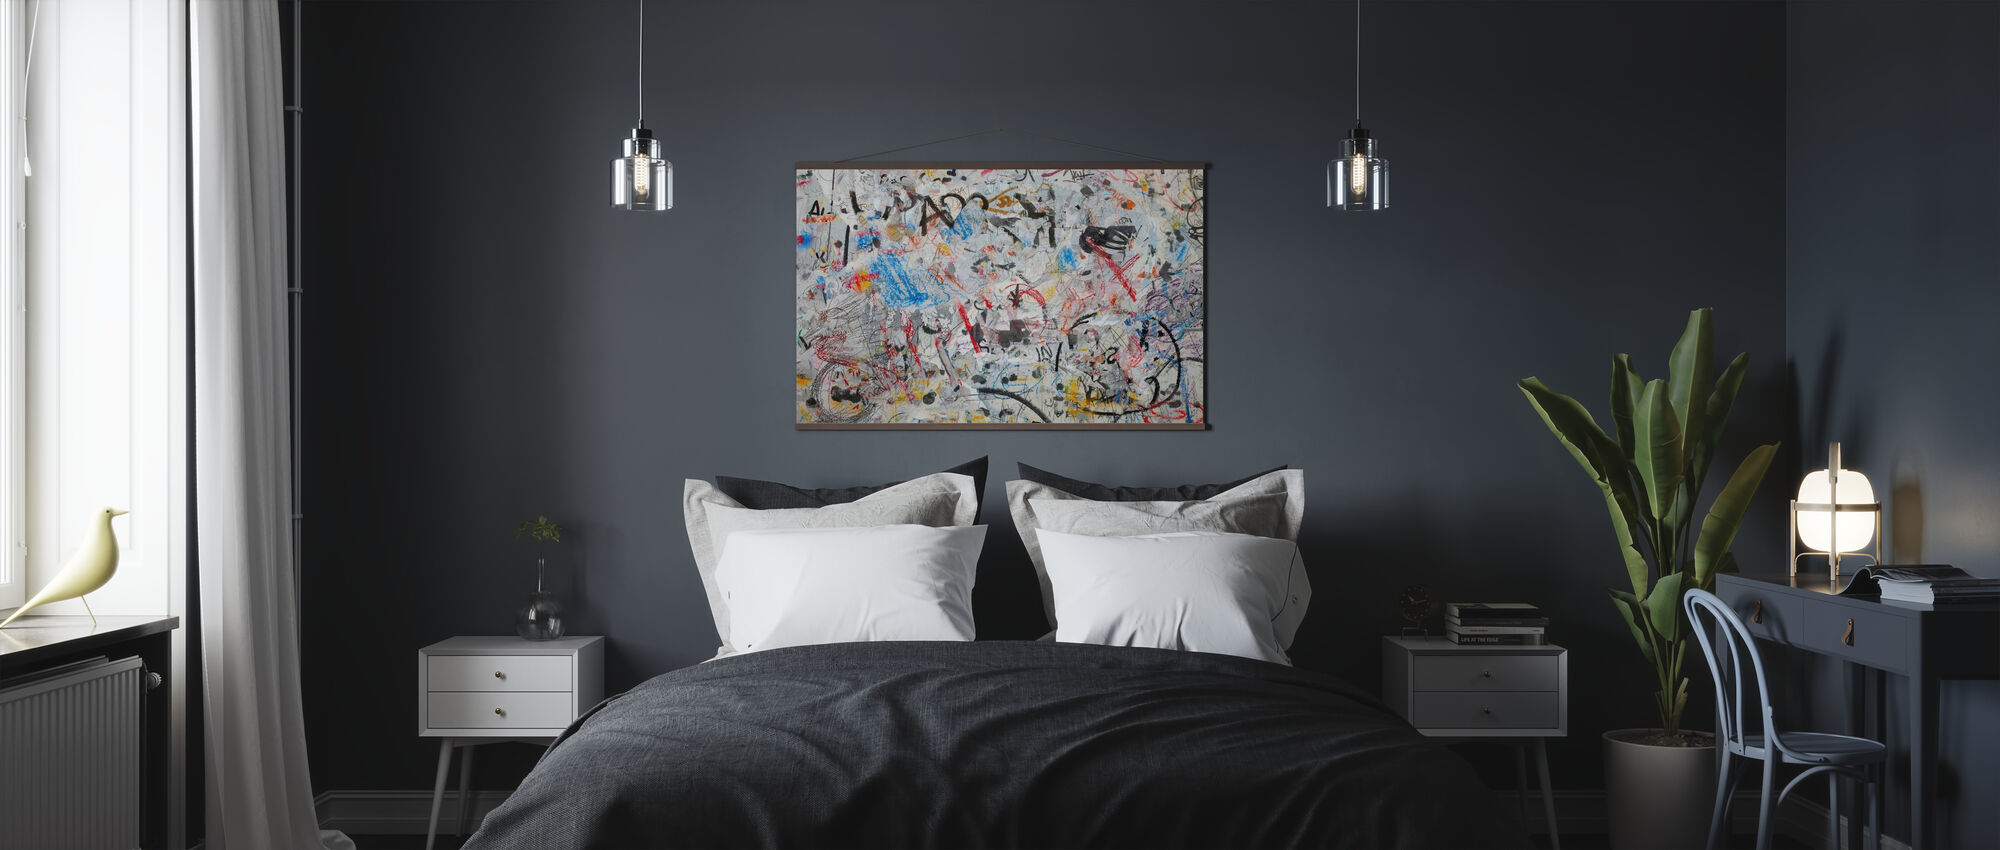 Grunge Graffiti Wall - Poster - Bedroom